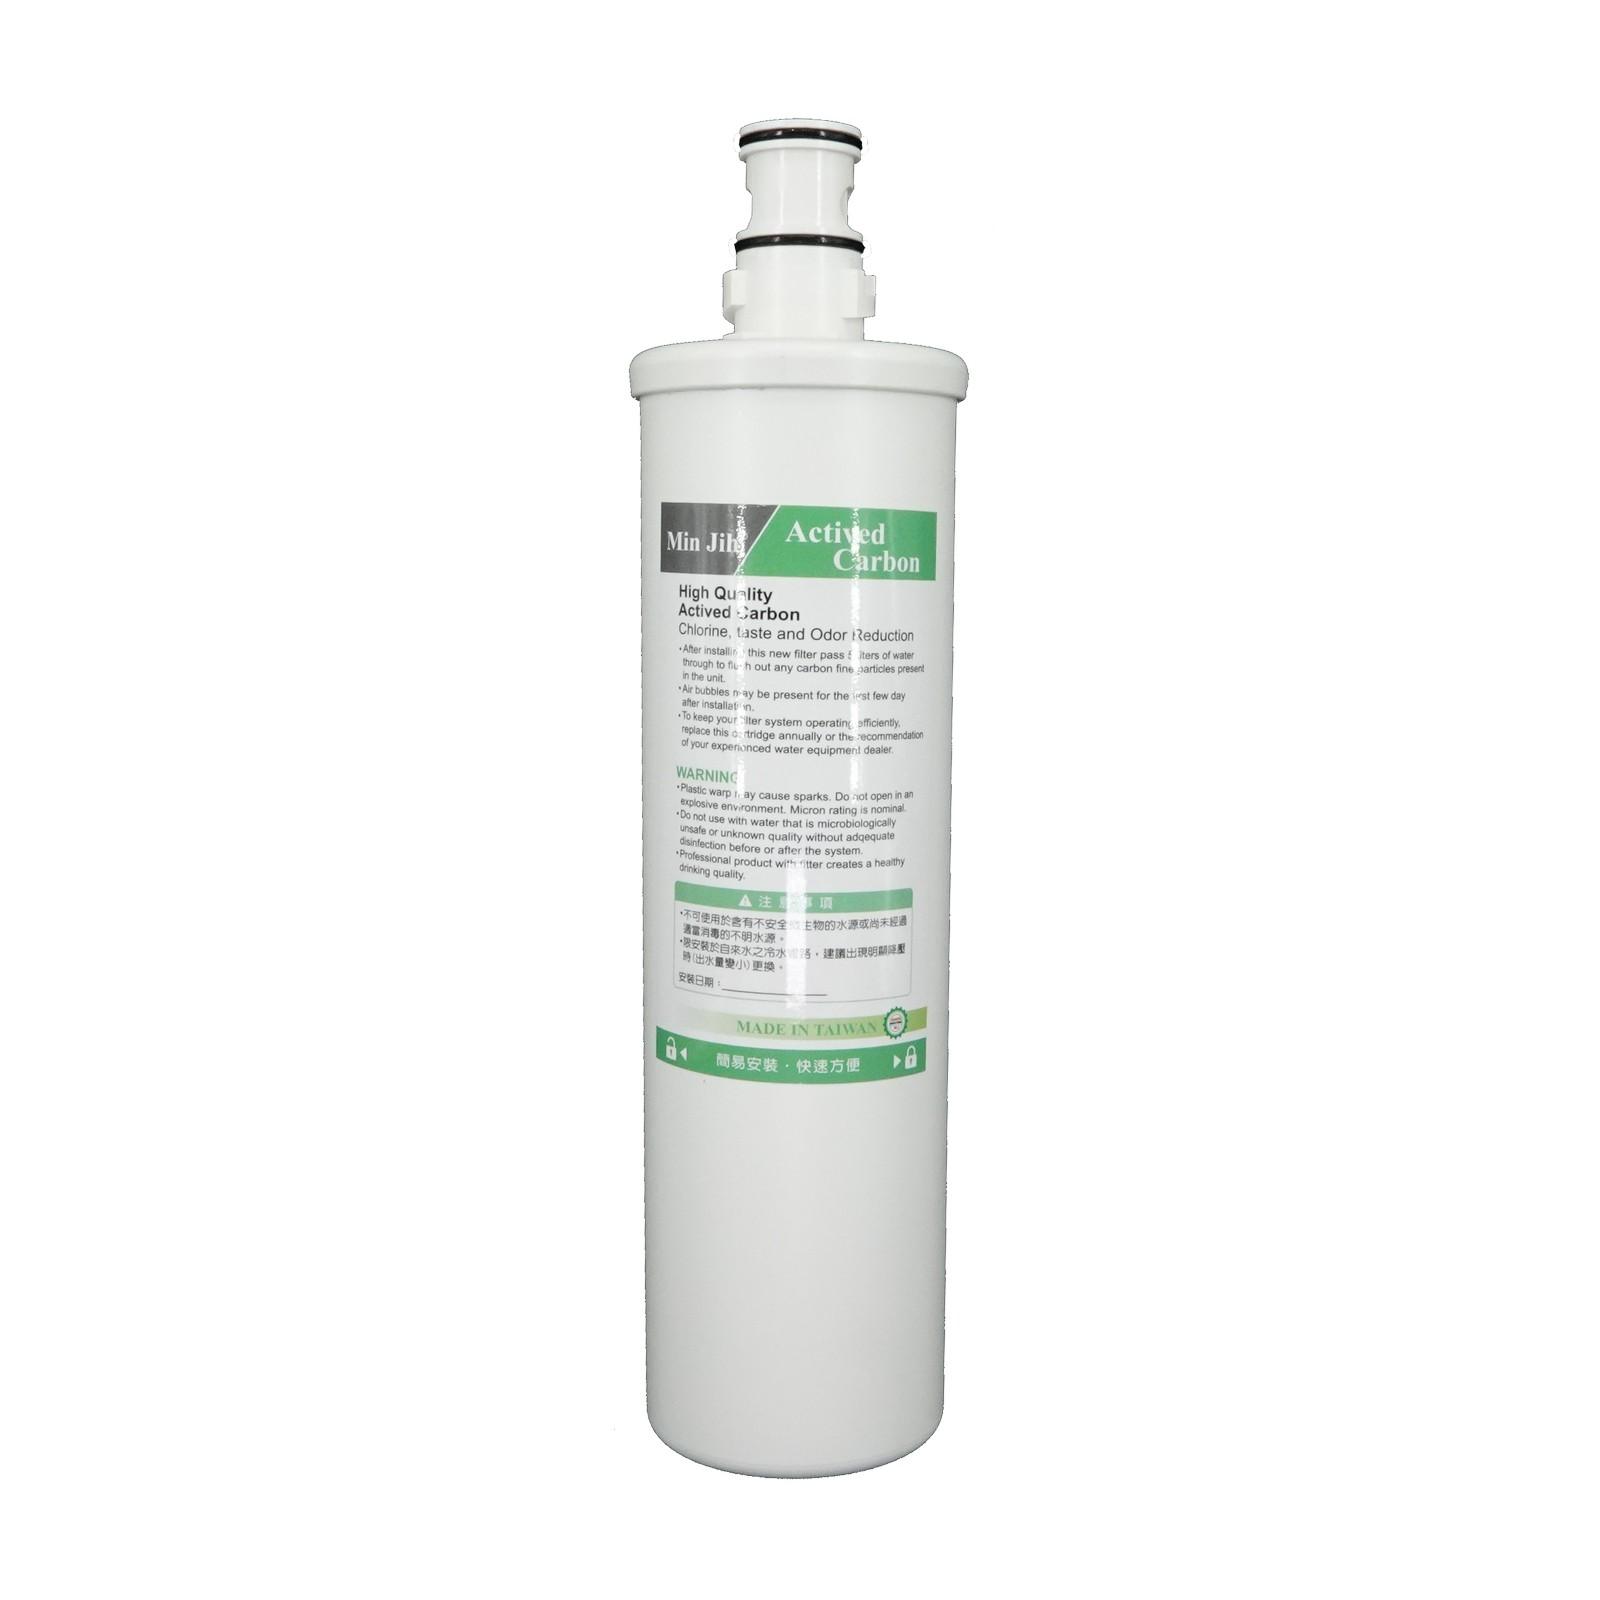 MS810活性碳濾心 – 民記實業股份有限公司 CLEAMTEC M.J